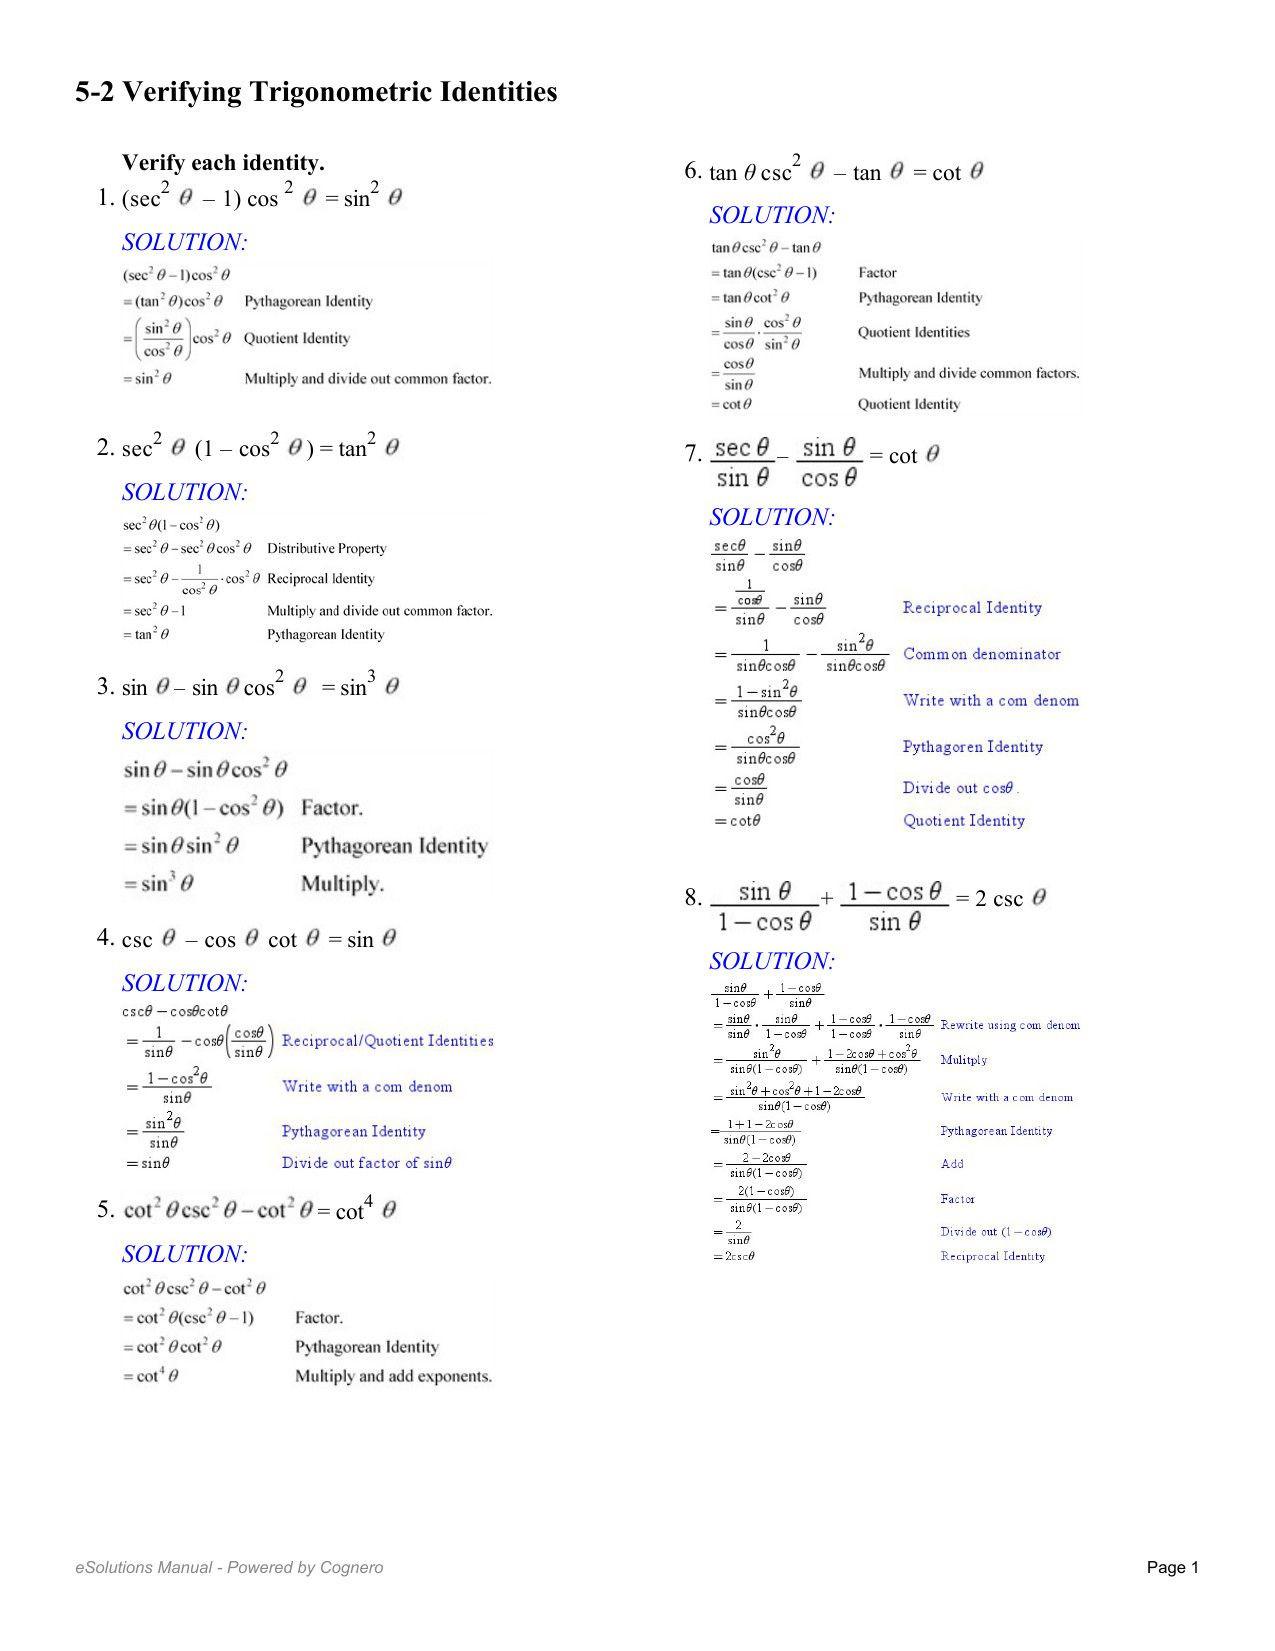 Verify Trig Identities Worksheet Legalperiodic Verifying Trigonometric Identities Worksheet